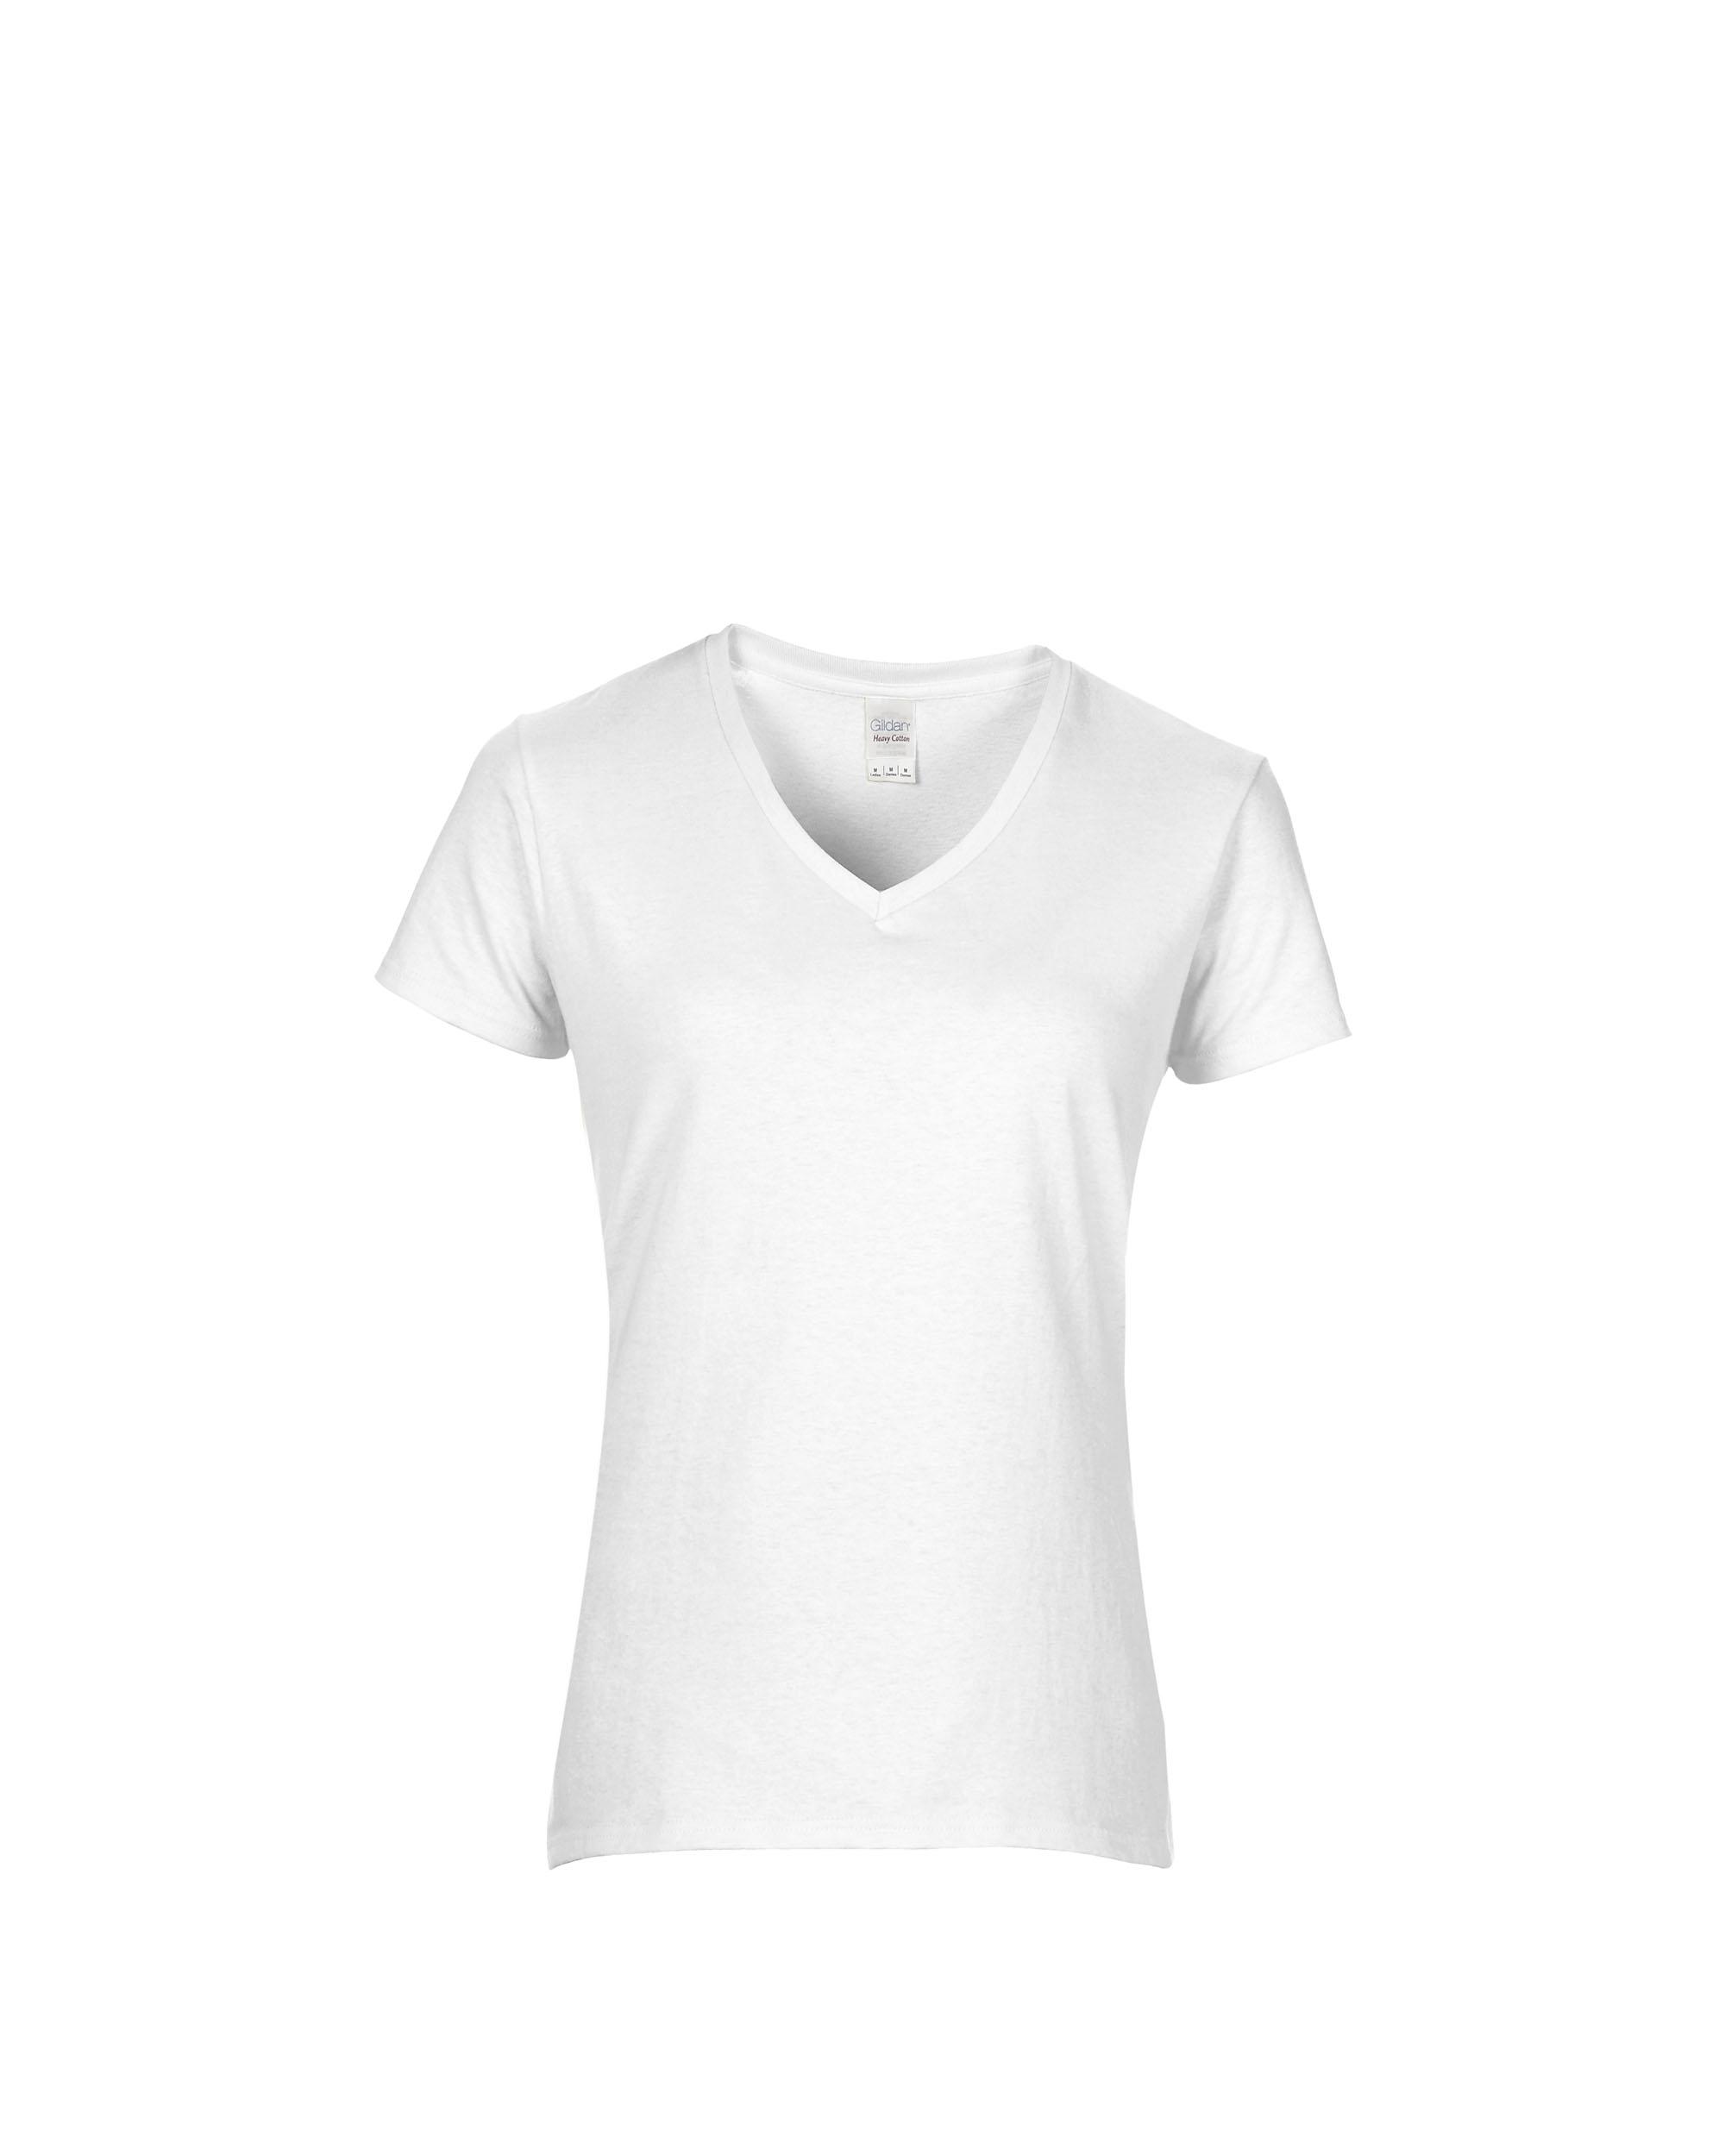 2f65b175966 Women's Soft Style Junior Fit V-Neck T-Shirt - Team Shirt Pros